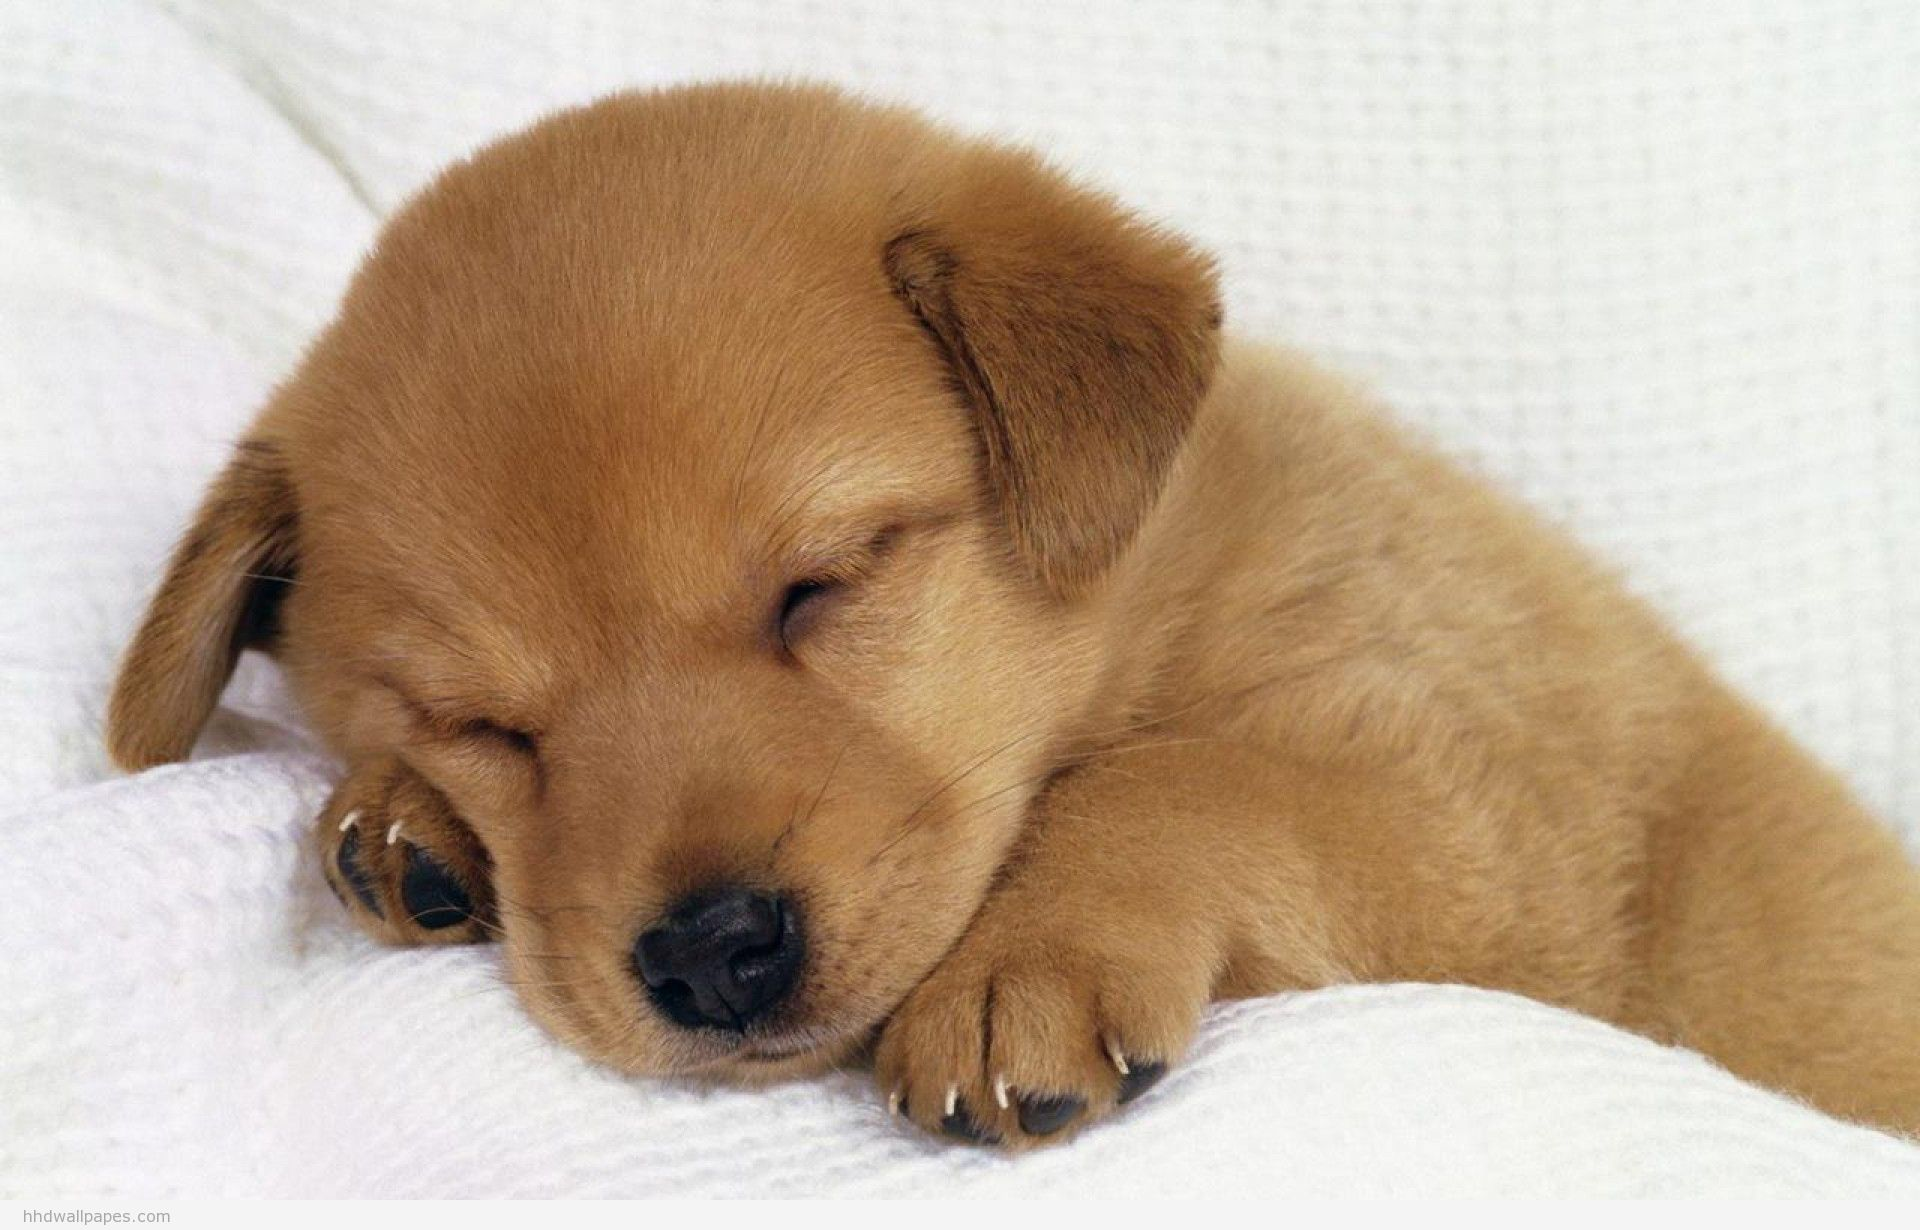 48] Cute Puppy Wallpaper HD on WallpaperSafari 1920x1230